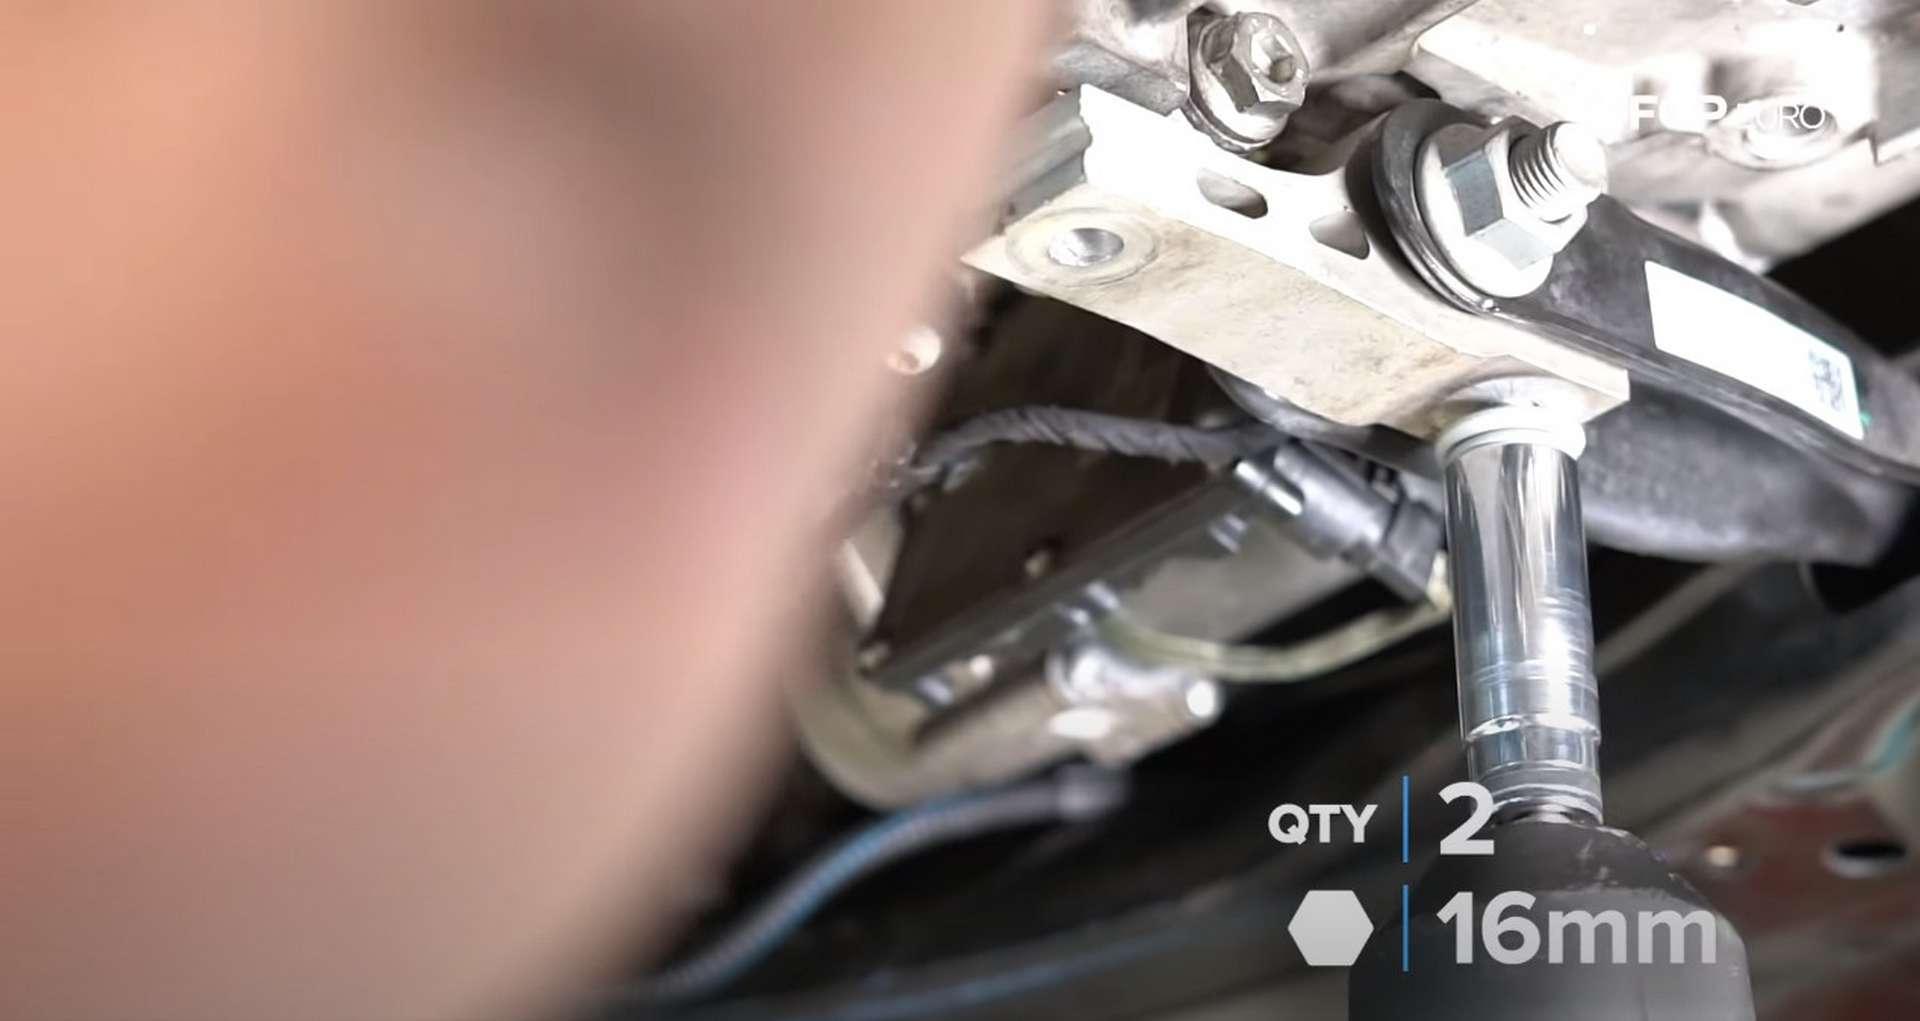 66-DIY_VW_GTI_Clutch-Job-Reinstalling-Starter